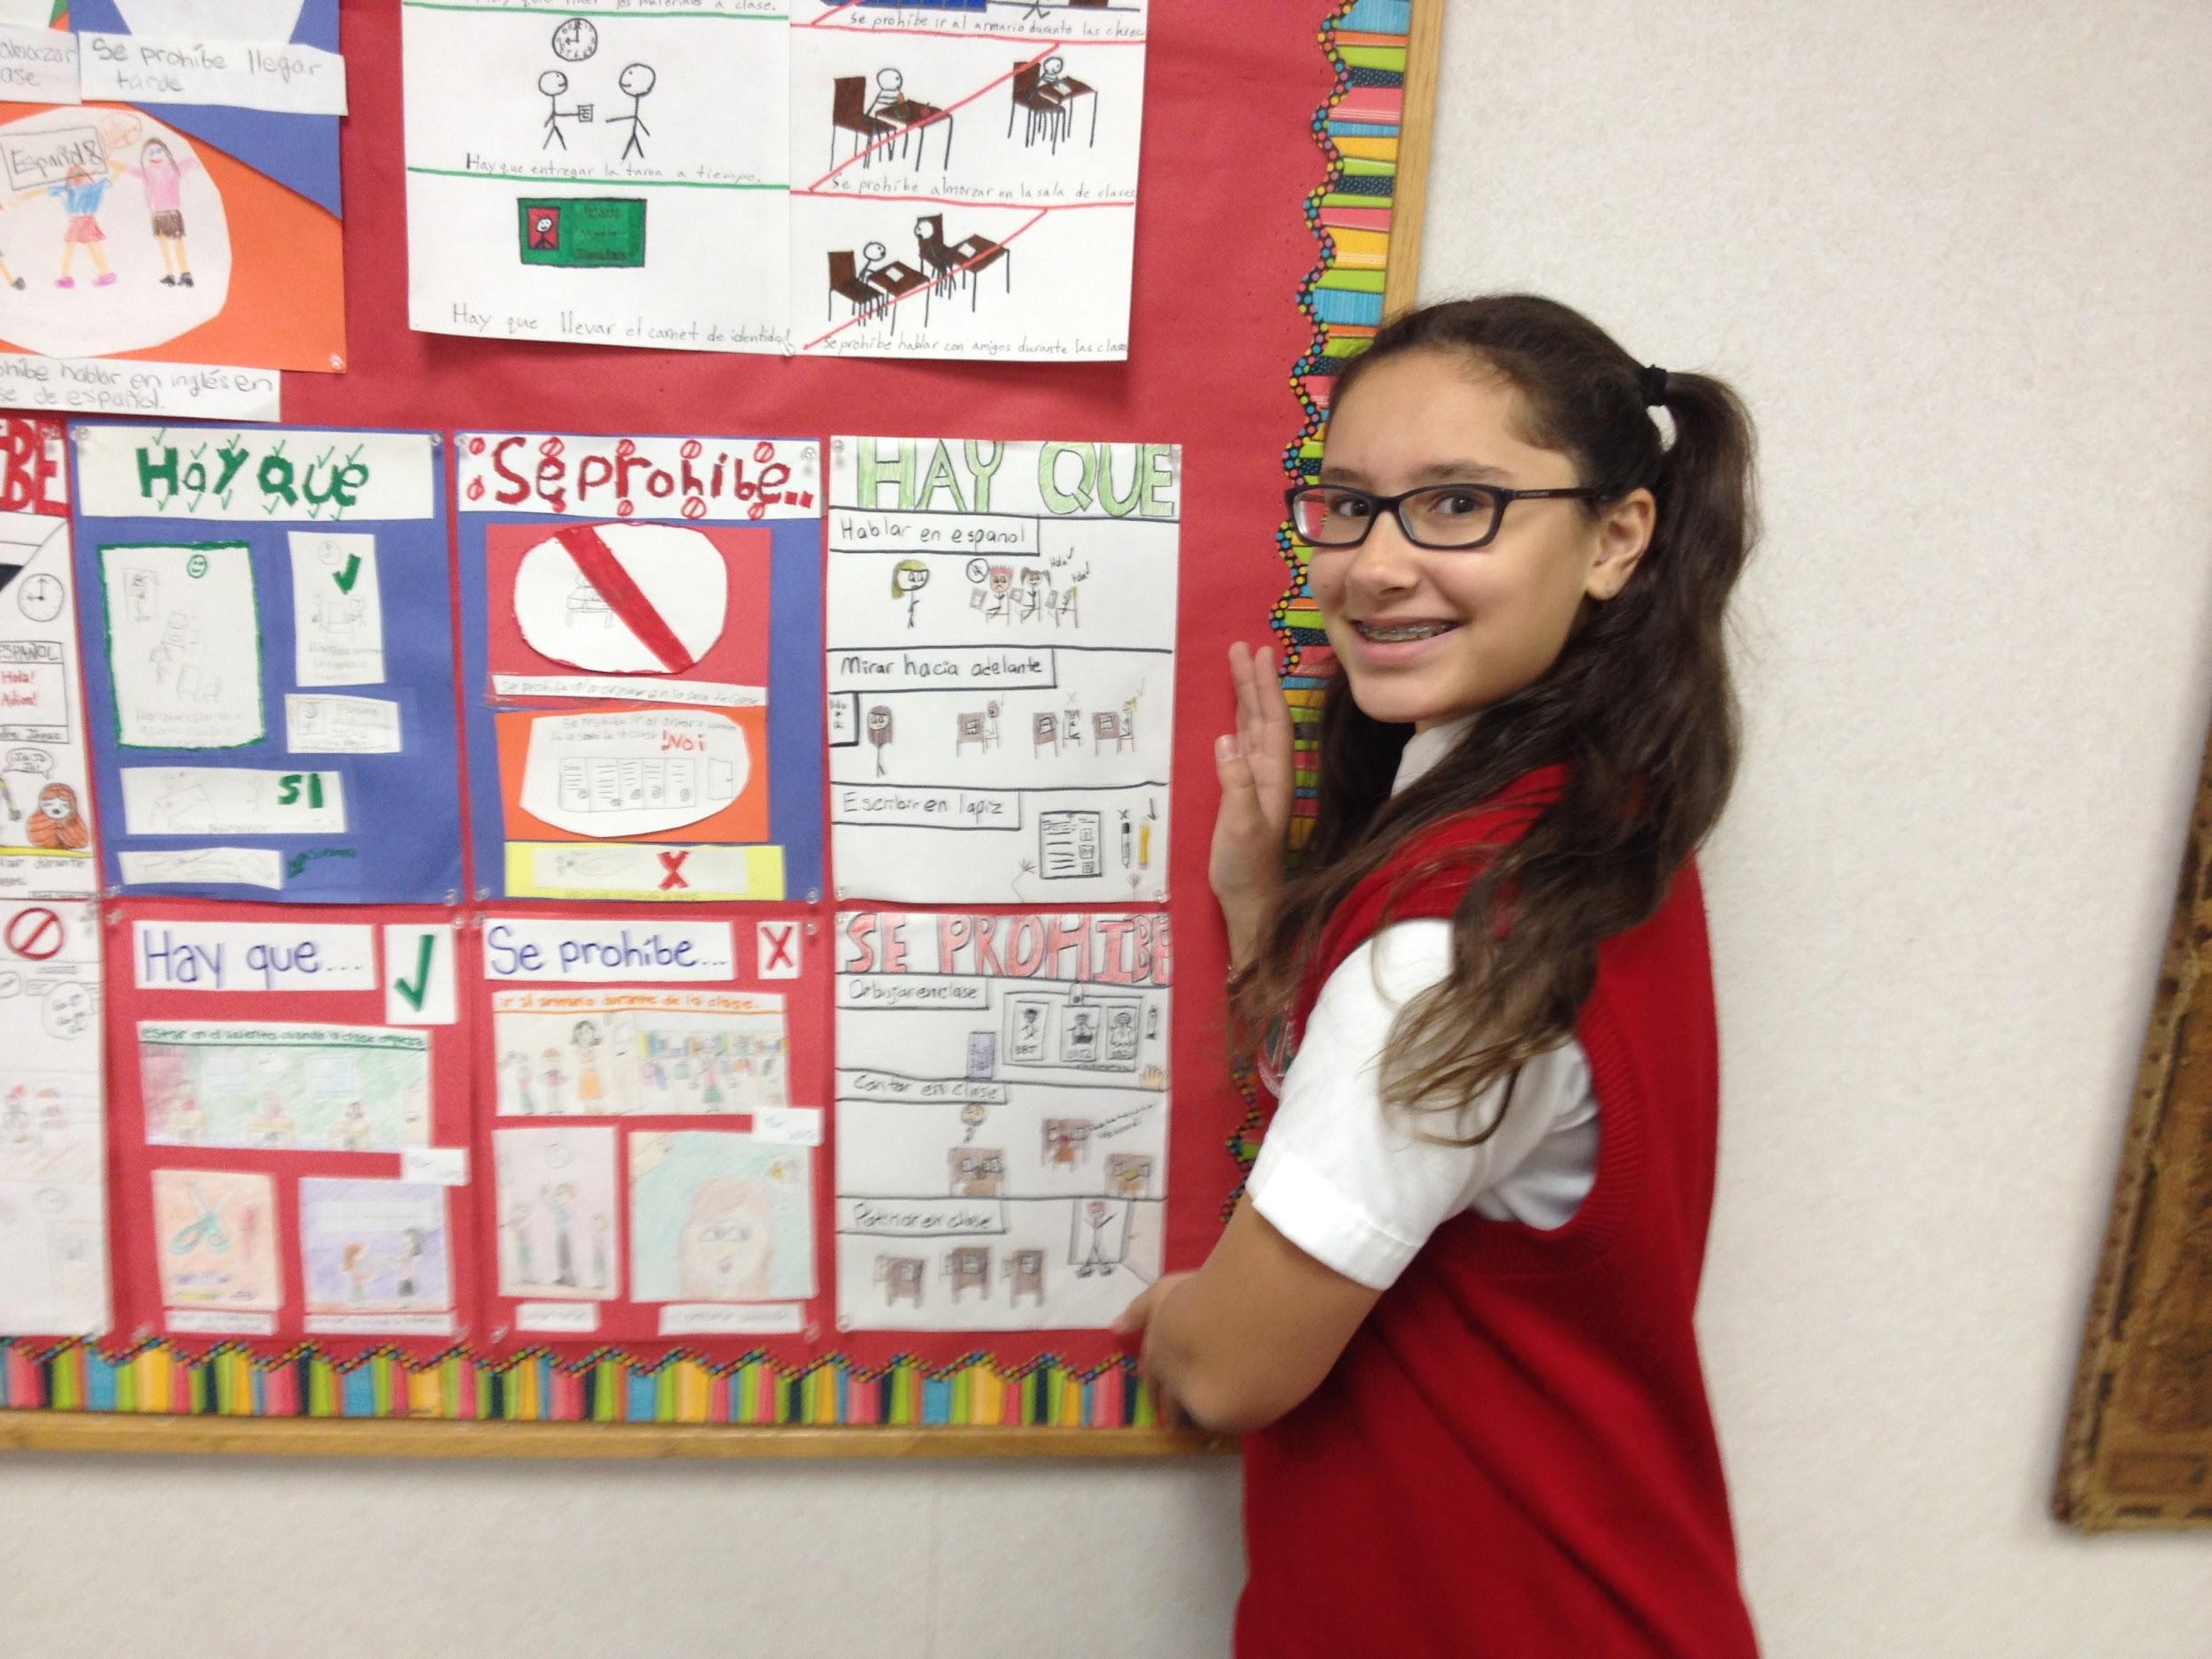 Spanish 4th 8th Grade